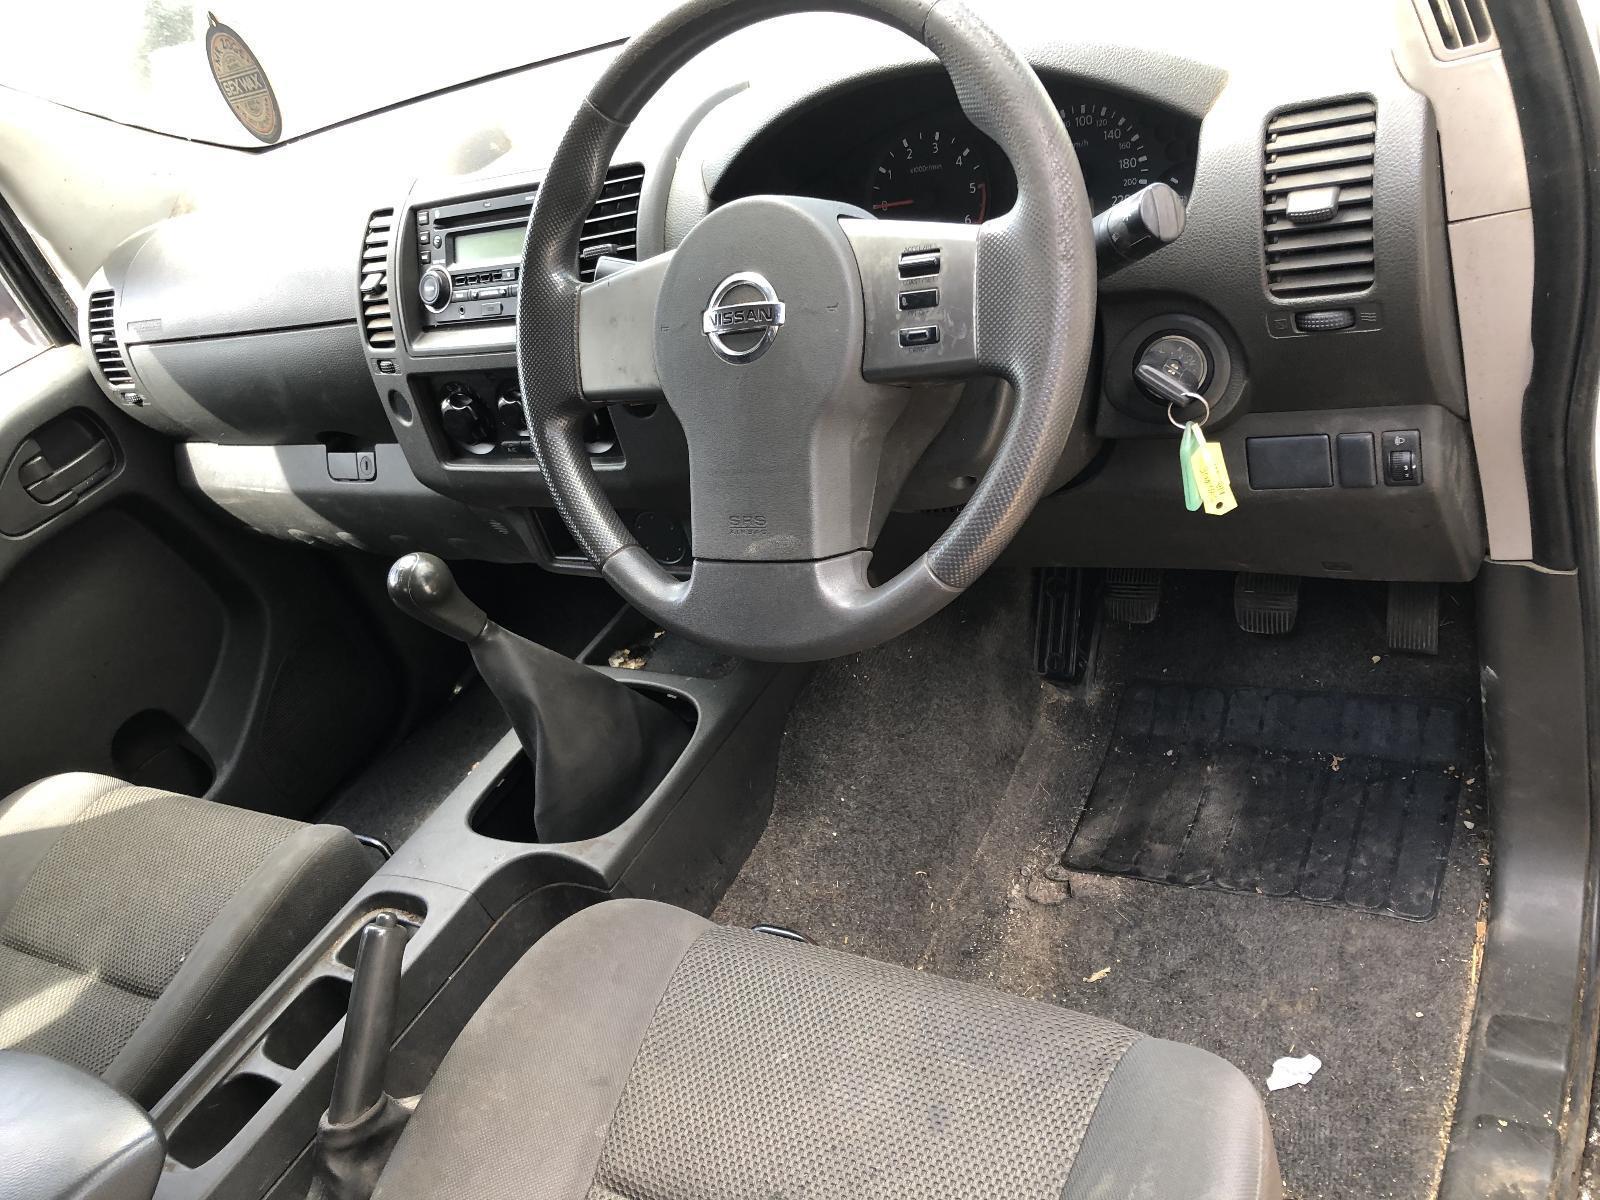 View Auto part Cable Nissan Navara 2011